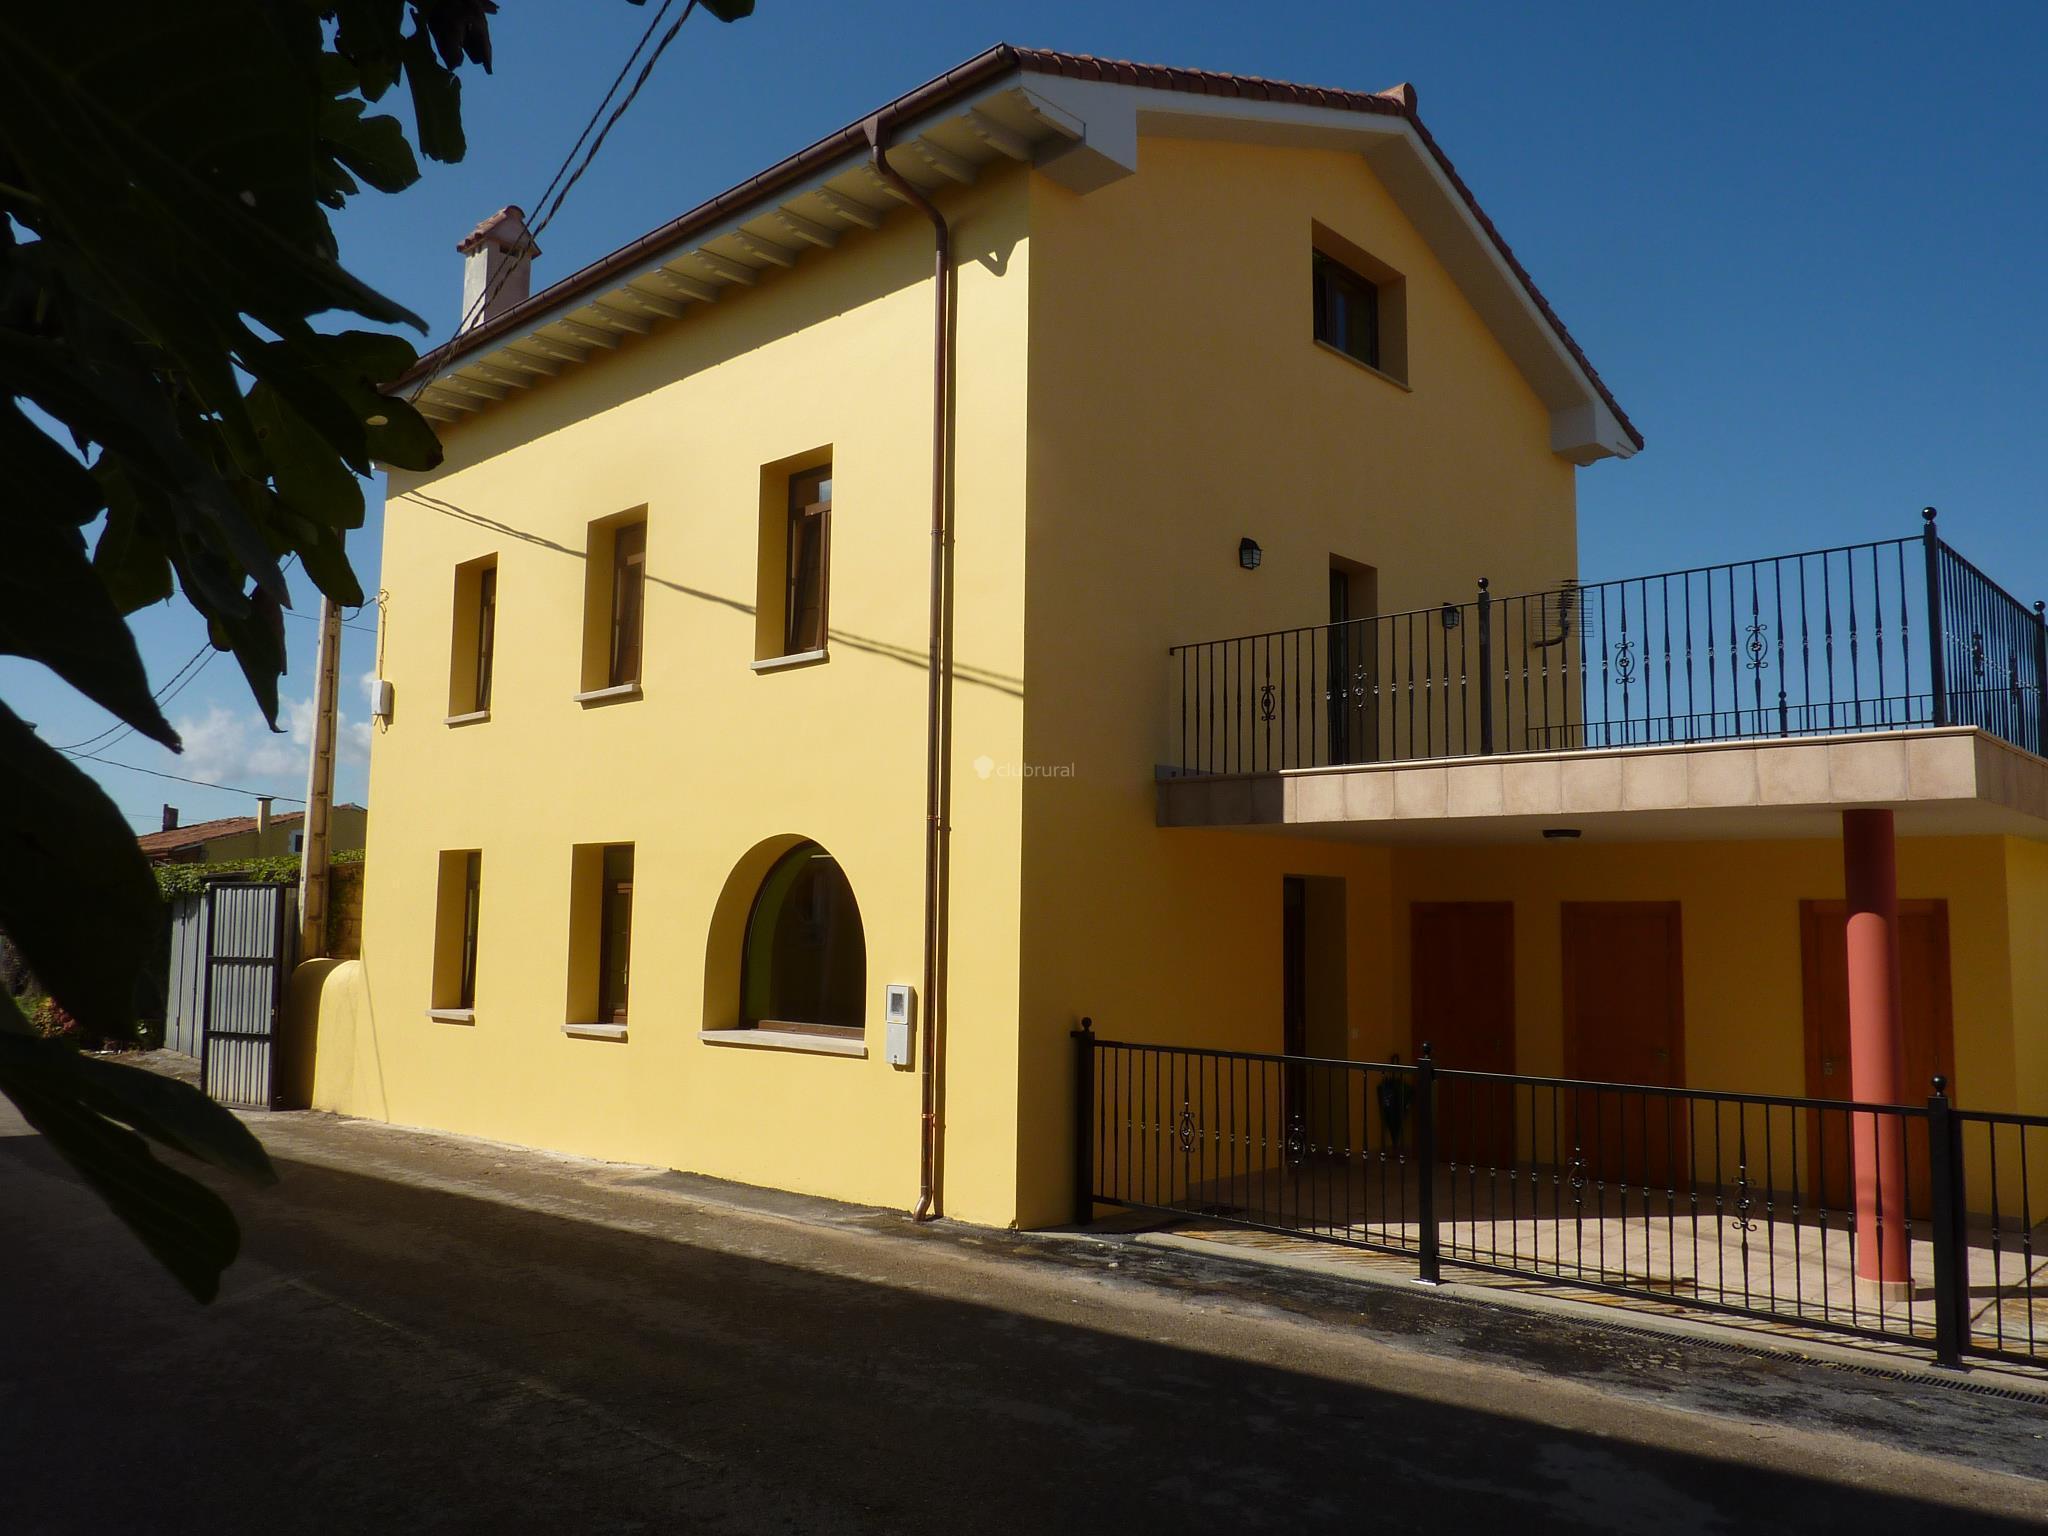 Fotos de albergue de cab rceno cantabria villaescusa clubrural - Casas rurales cantabria alquiler integro ...